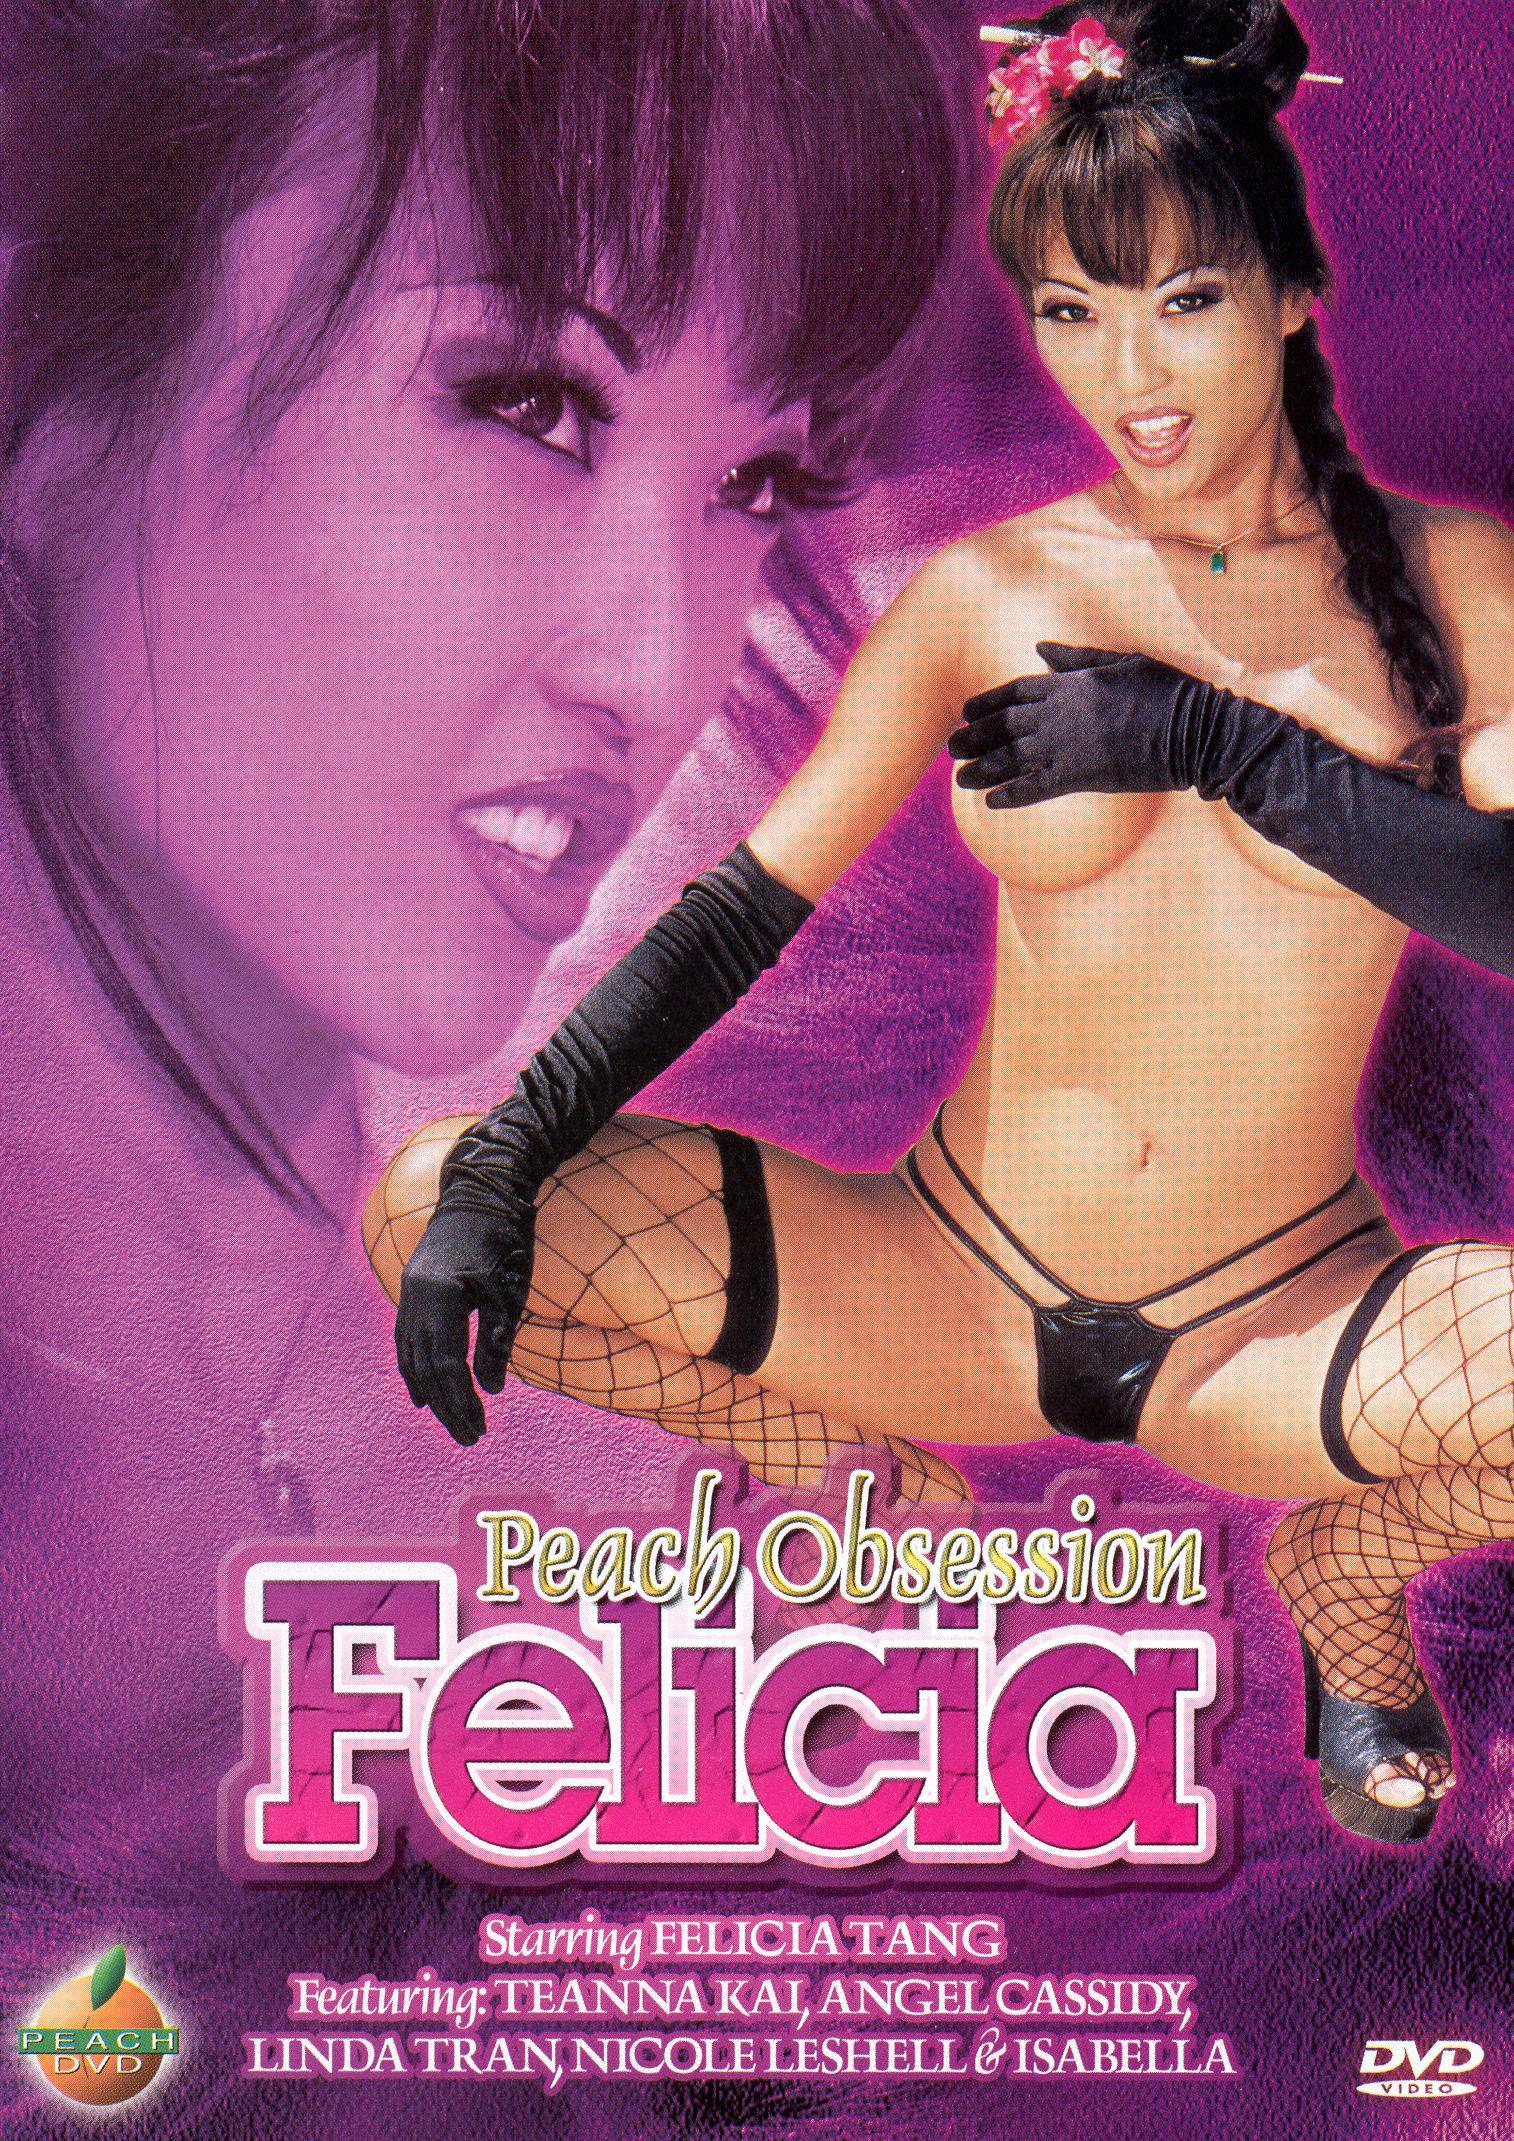 Peach Obsession: Felicia